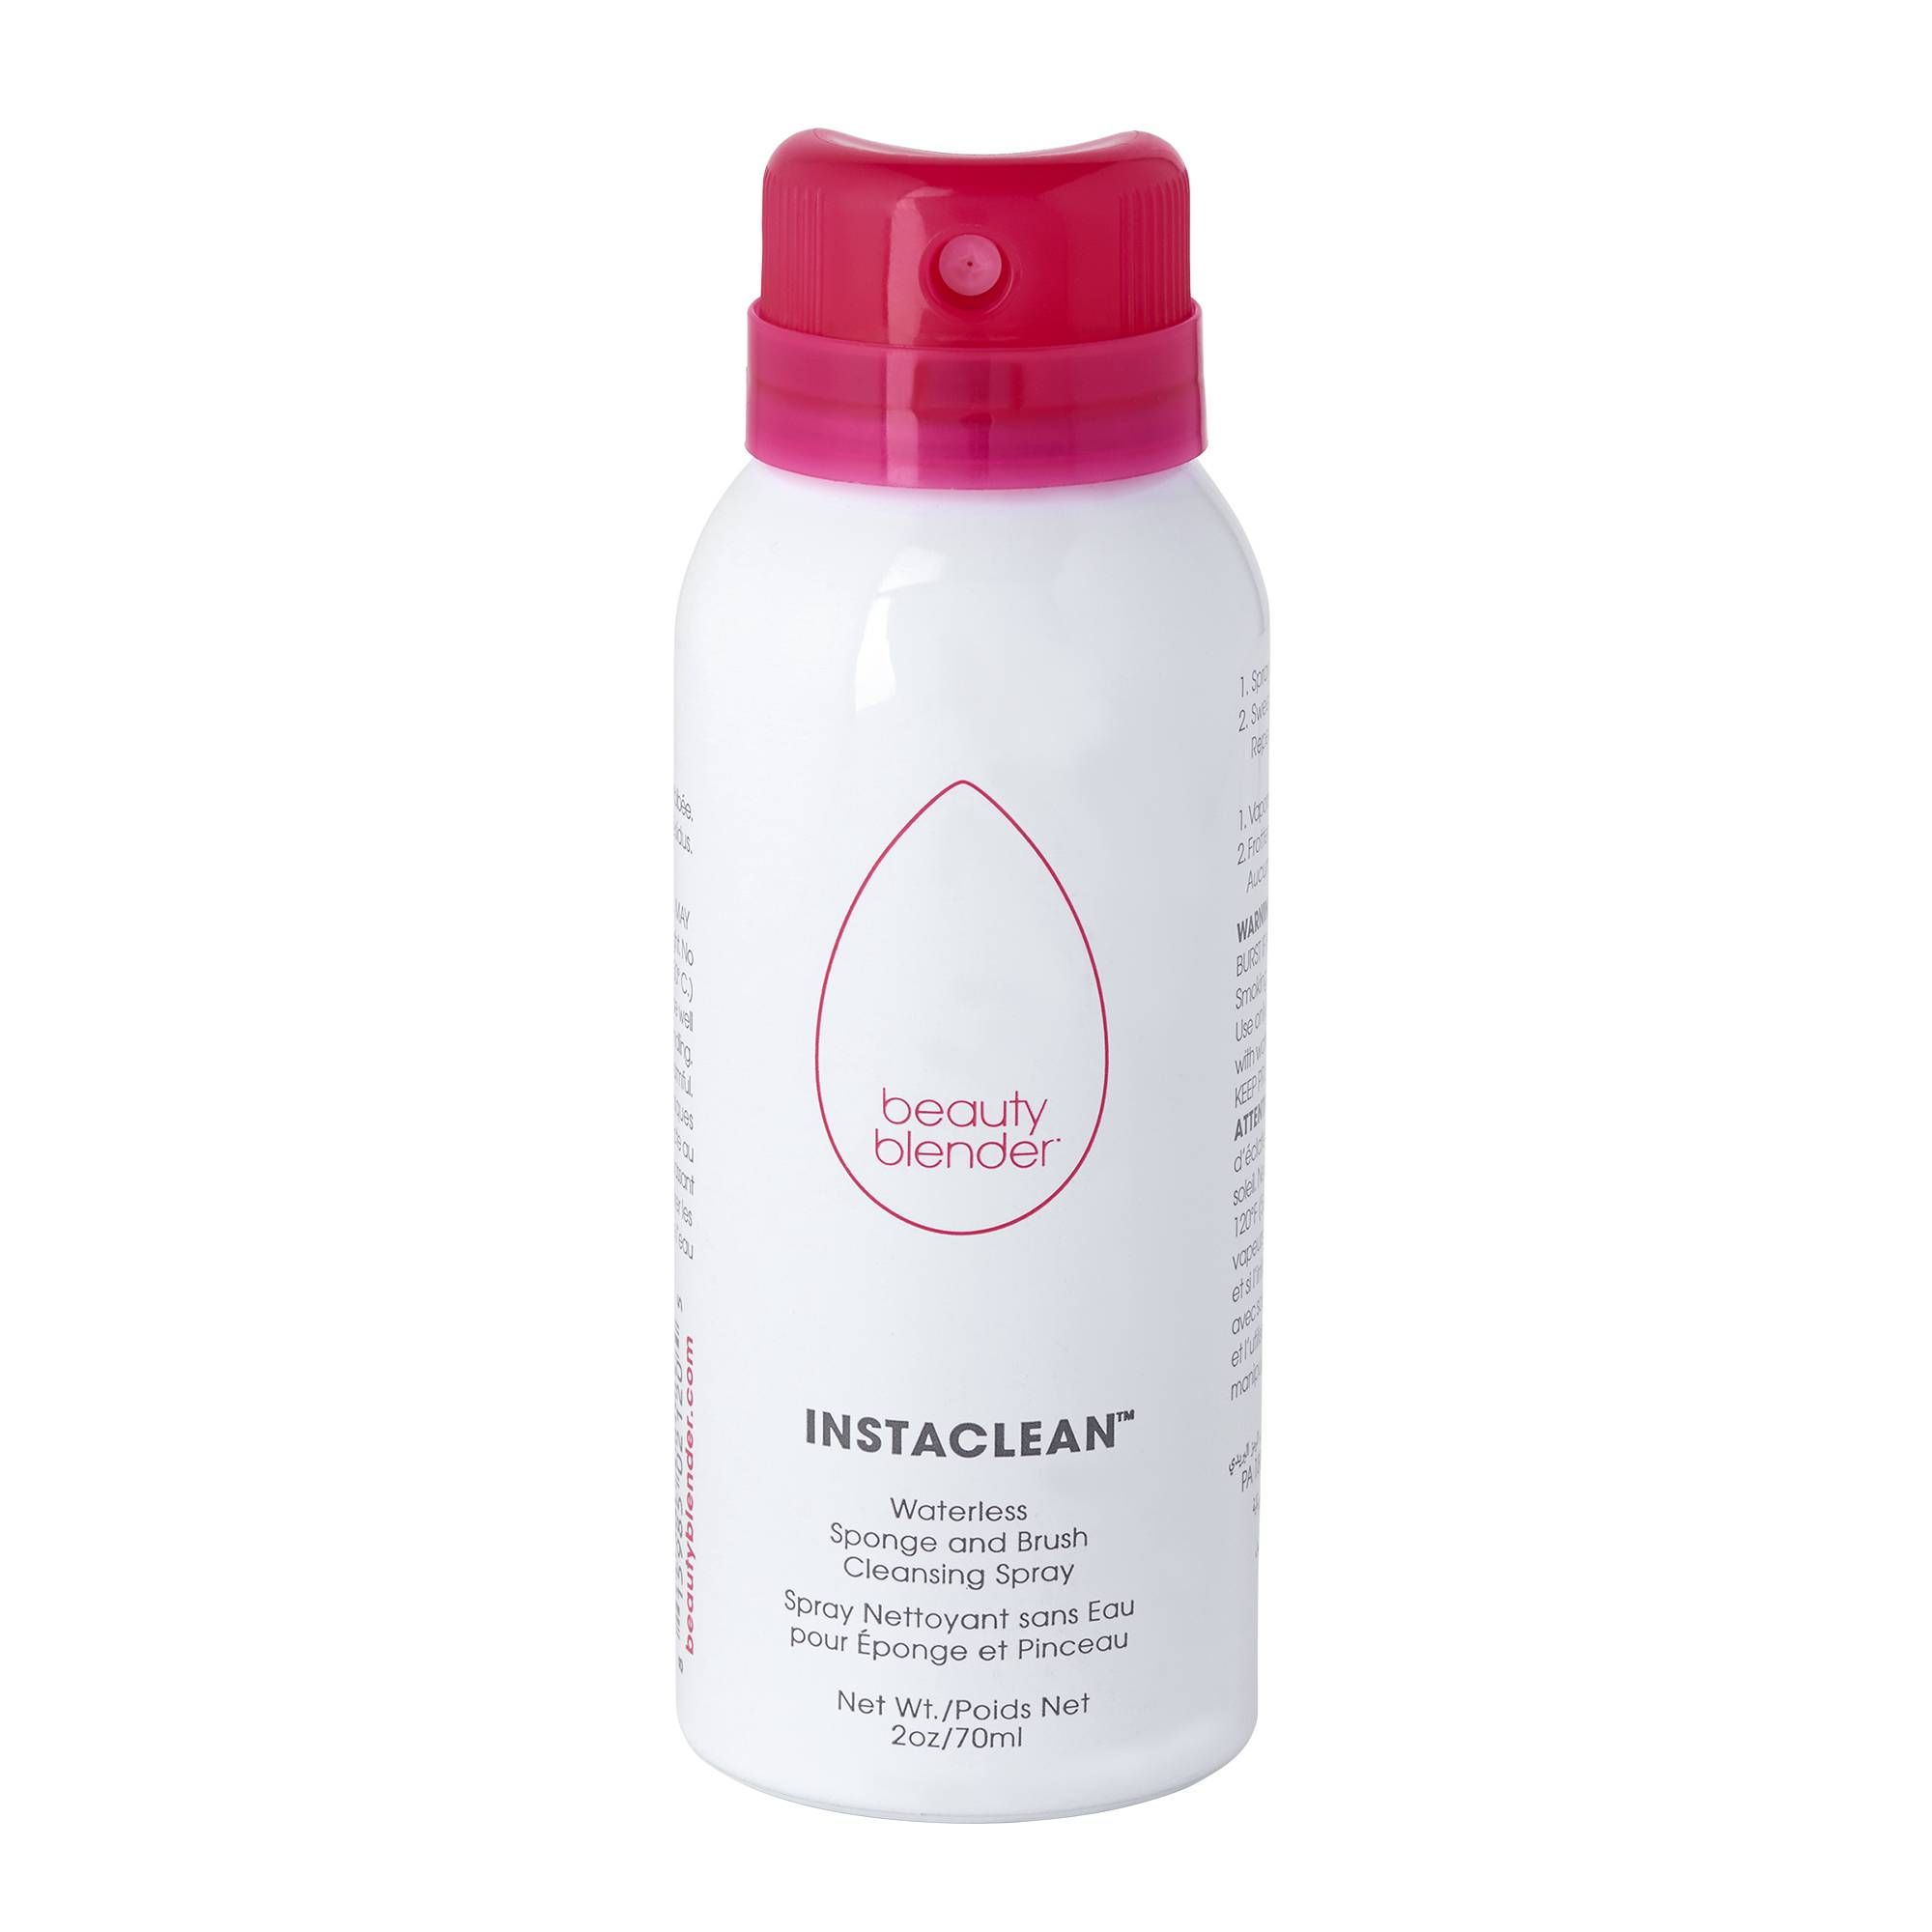 beautyblender Instaclean 60ml